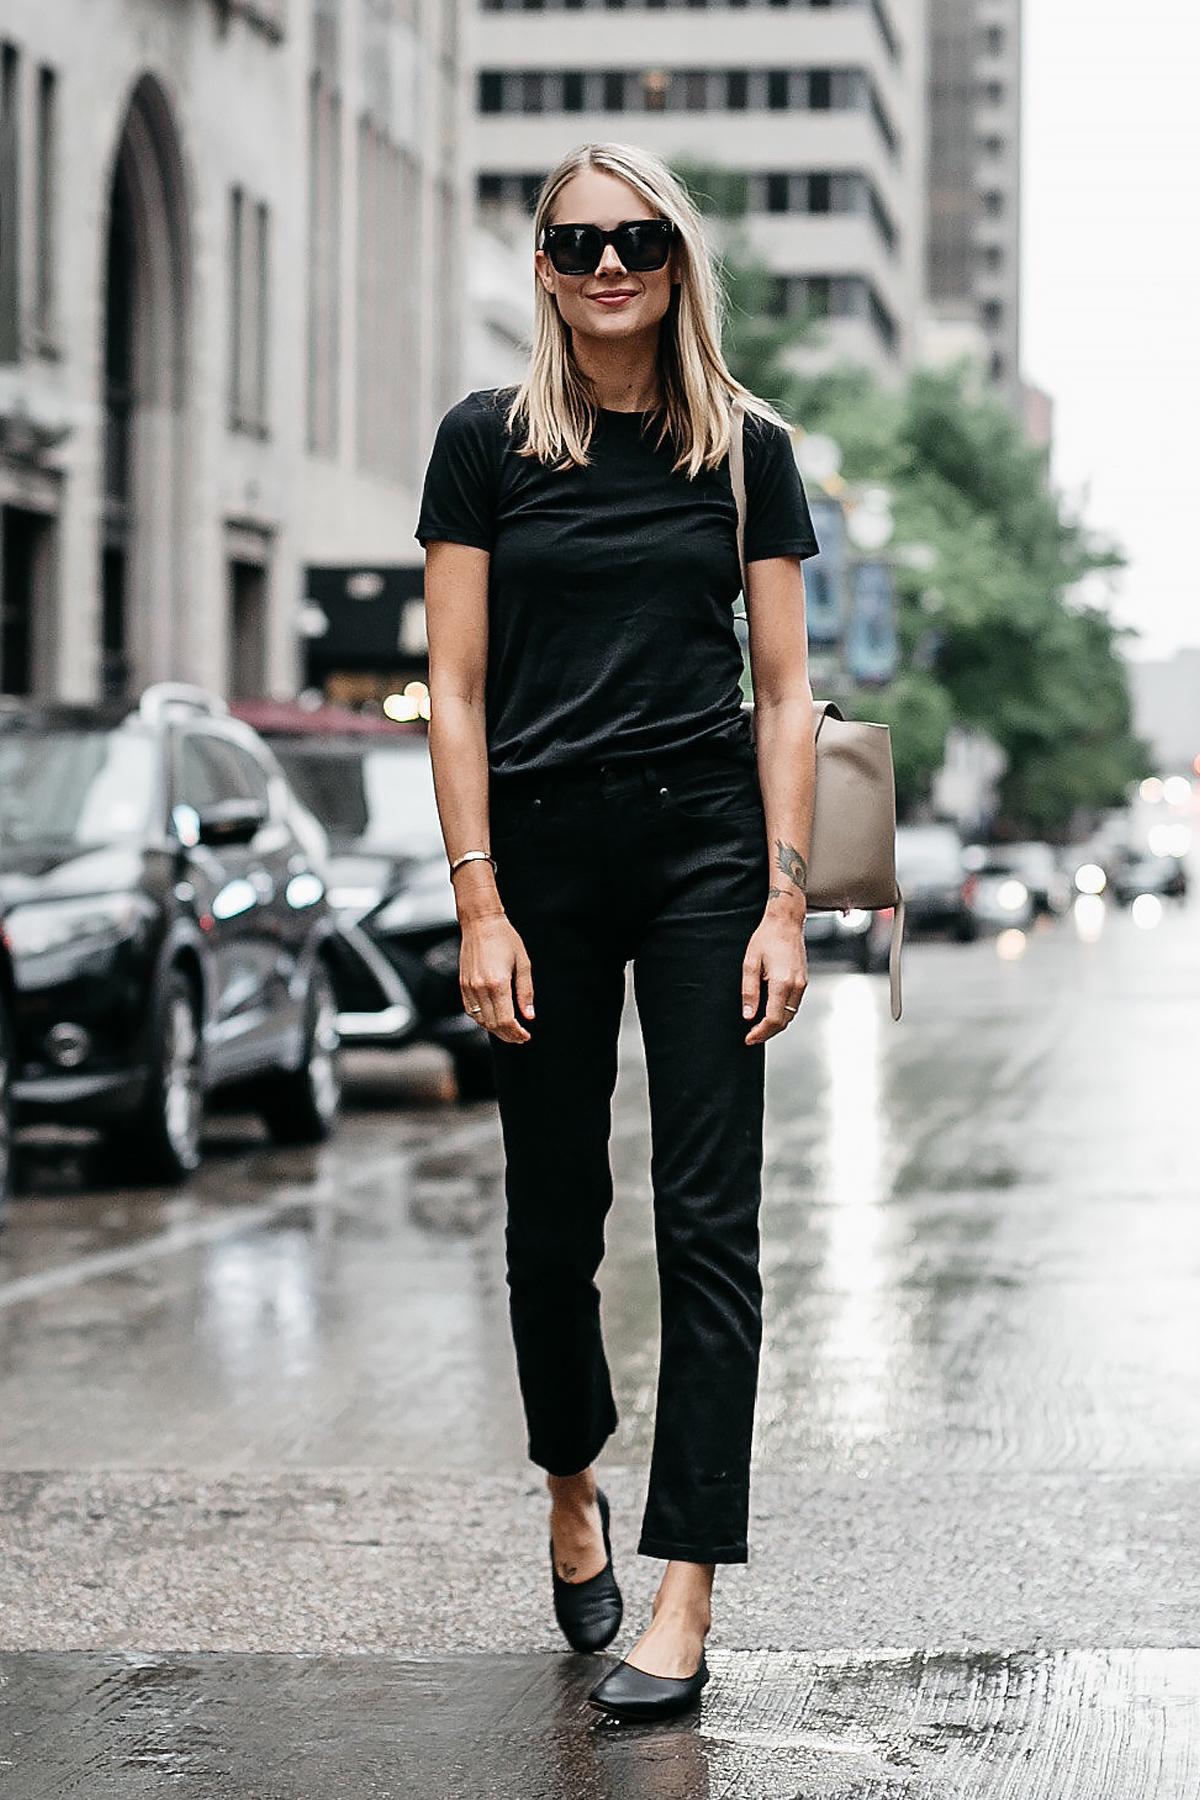 419cd889543 Blonde Woman Wearing Everlane Black Tshirt Everlane Black Boyfriend Jeans Everlane  Black Day Glove Flats Fashion